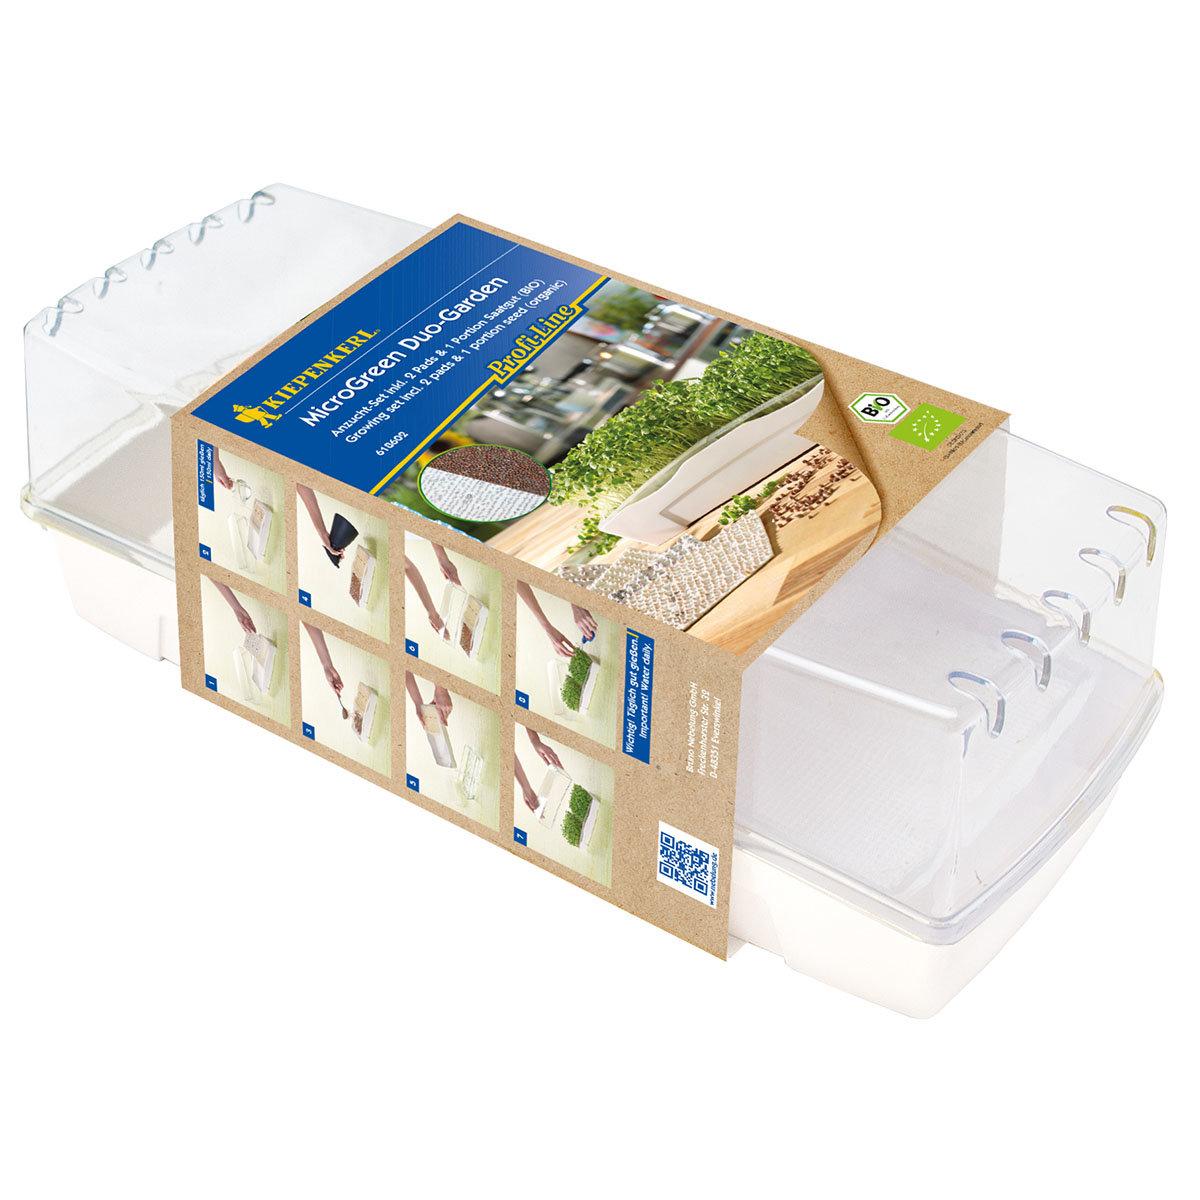 MicroGreen Duo-Garden Anzucht-Set mit 2 Pads & 1 Port. Saatgut | #2